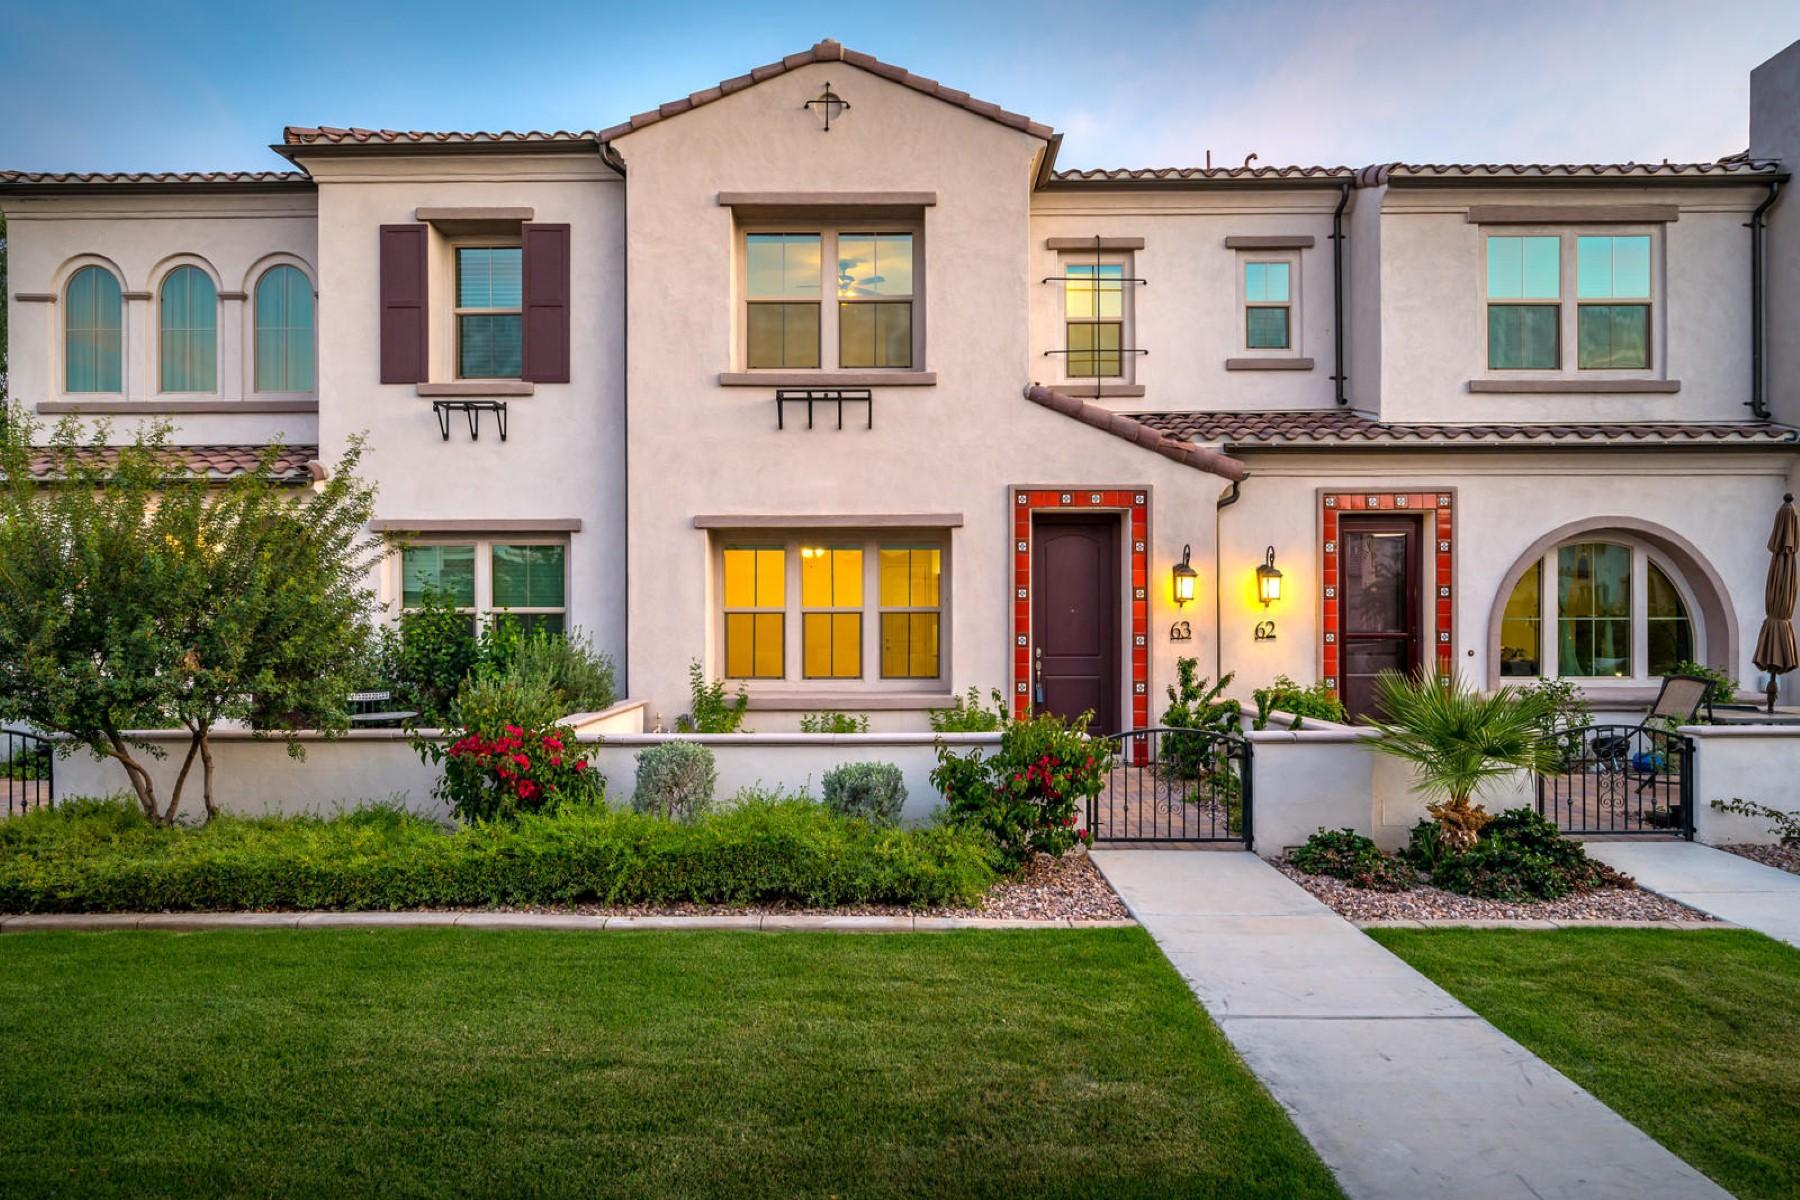 townhouses για την Πώληση στο Siena At Ocotillo Condominium 2477 W Market PL 63, Chandler, Αριζονα 85248 Ηνωμένες Πολιτείες